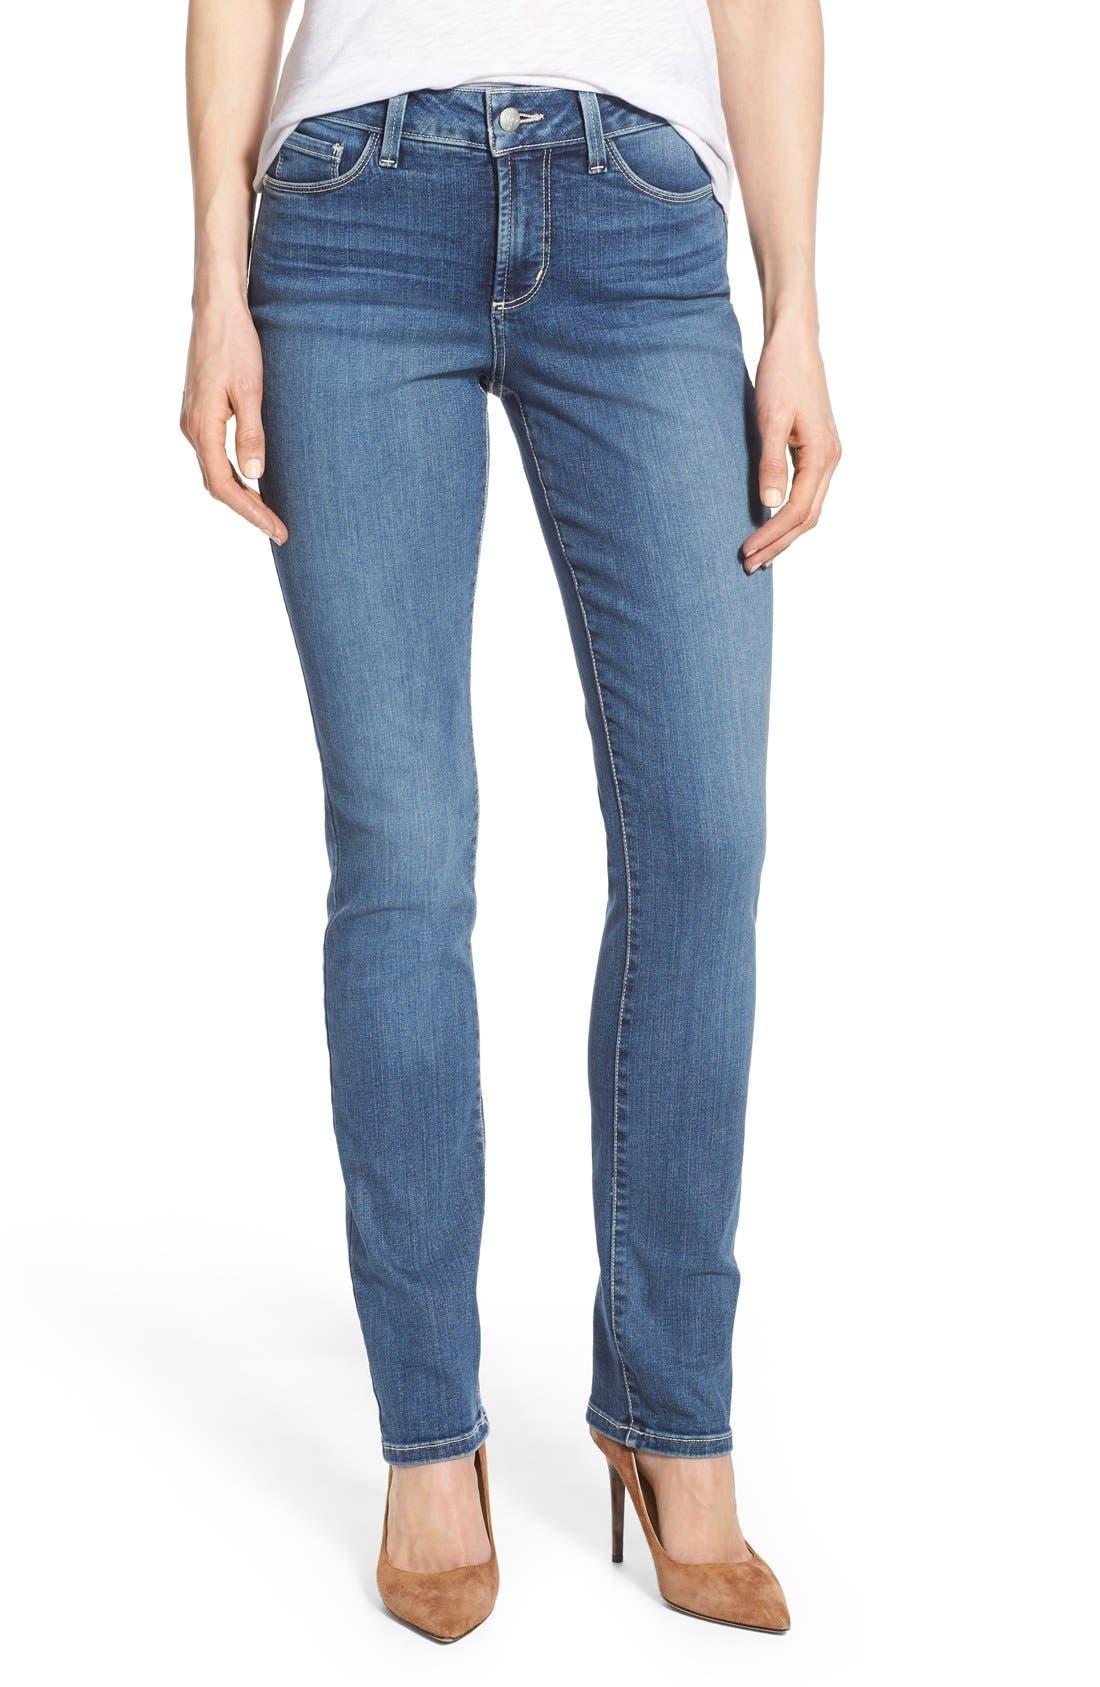 Main Image - NYDJ 'Samantha' Stretch Slim Straight Leg Jeans (Heyburn) (Regular & Petite)